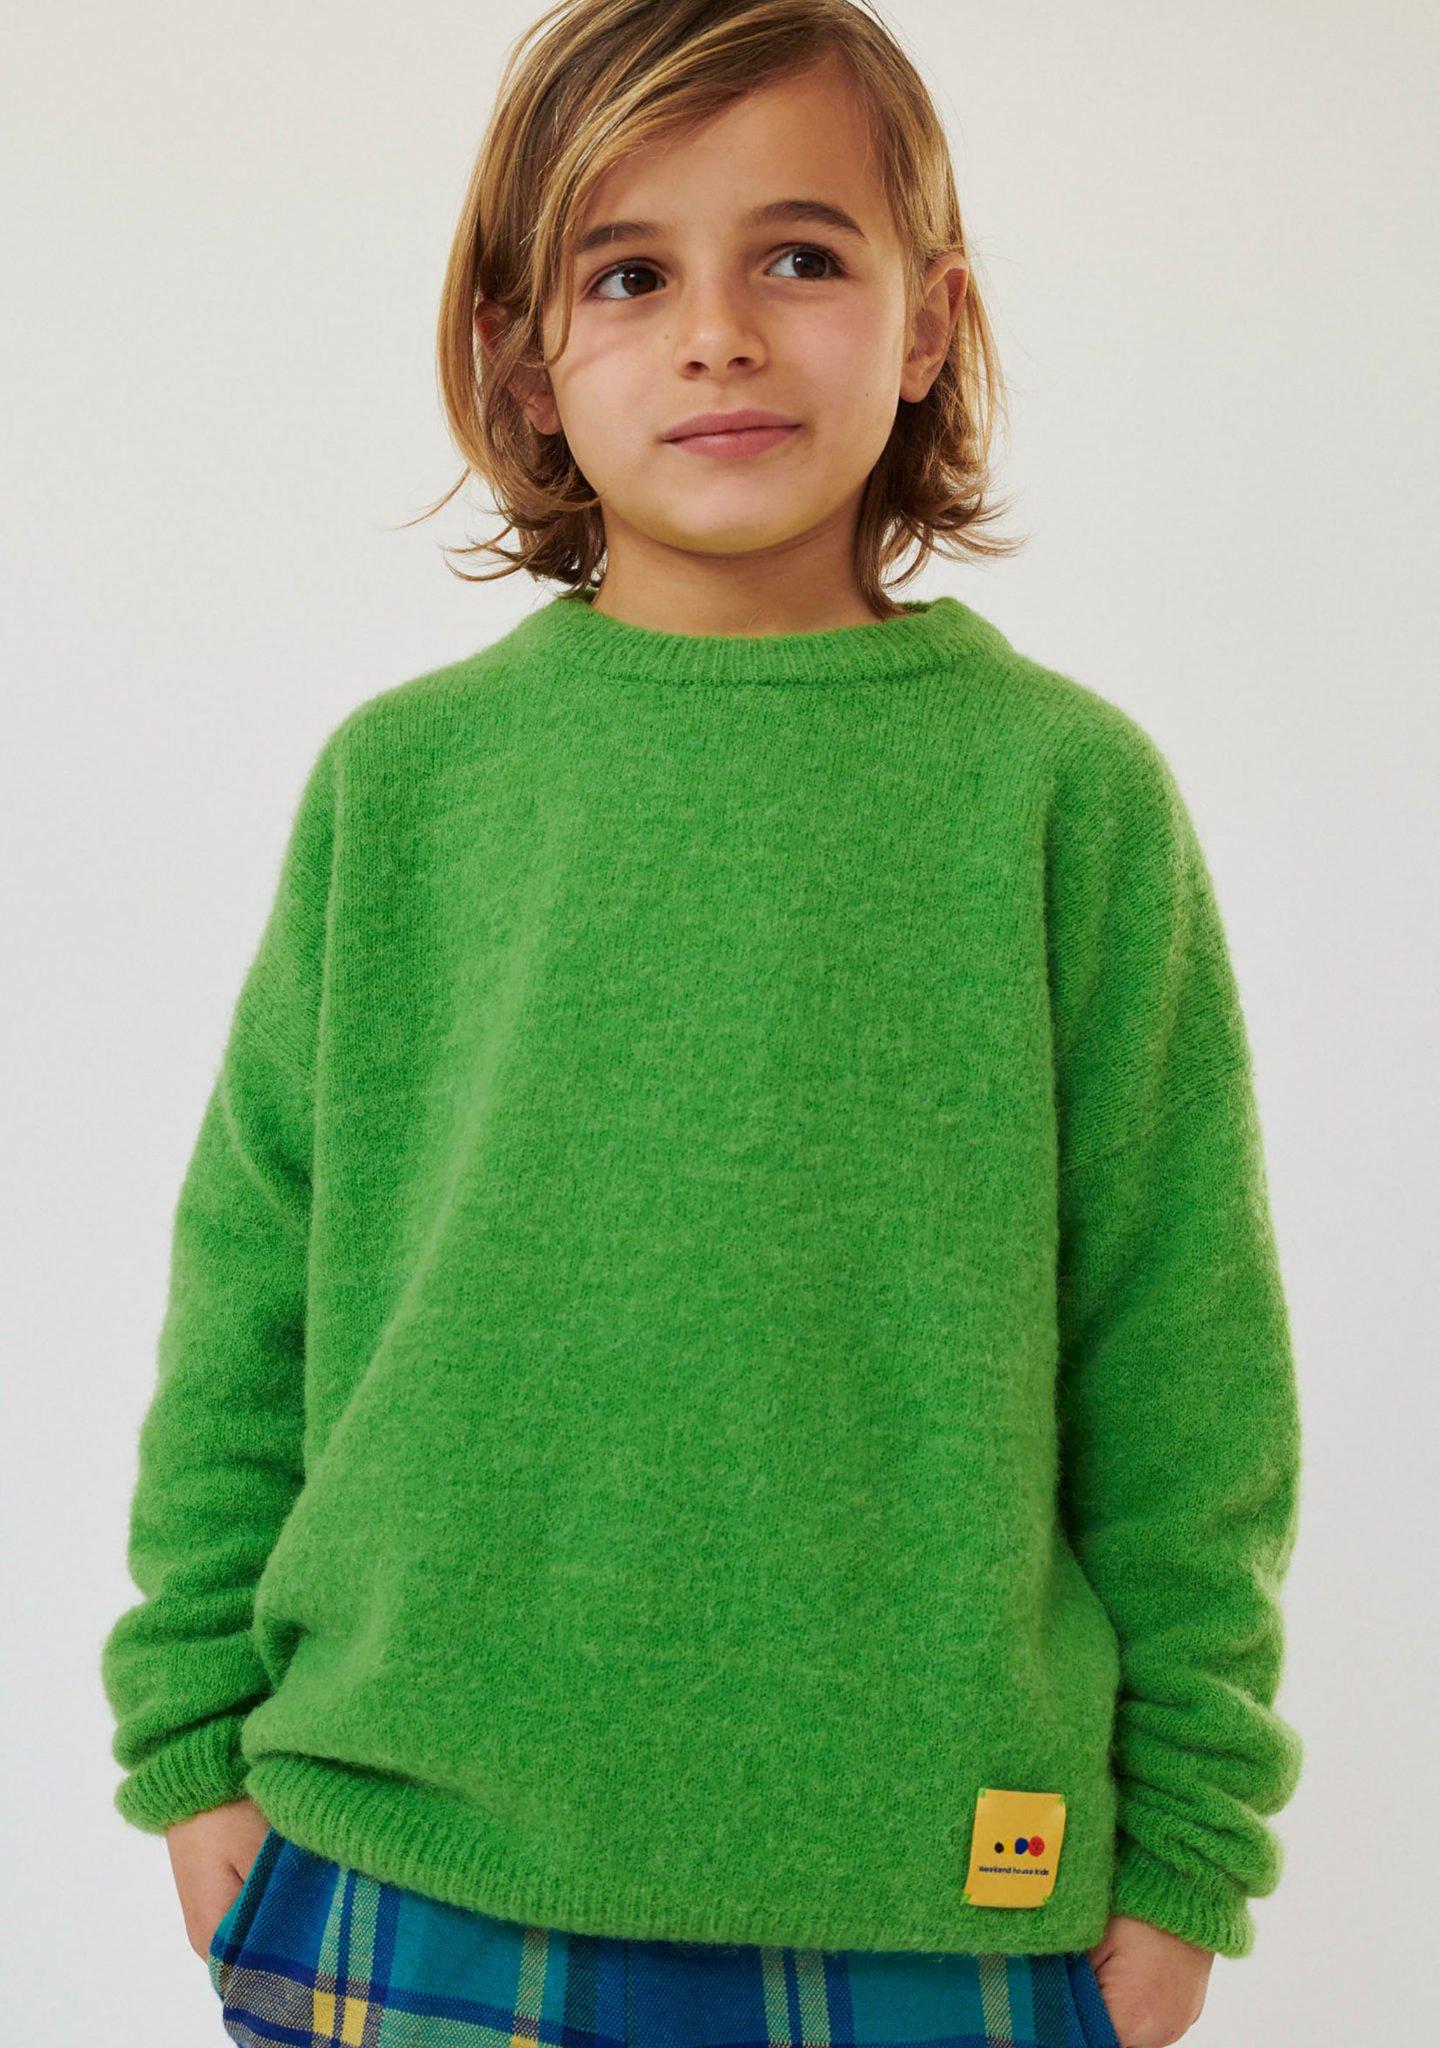 Alpaca Sweater for Kids